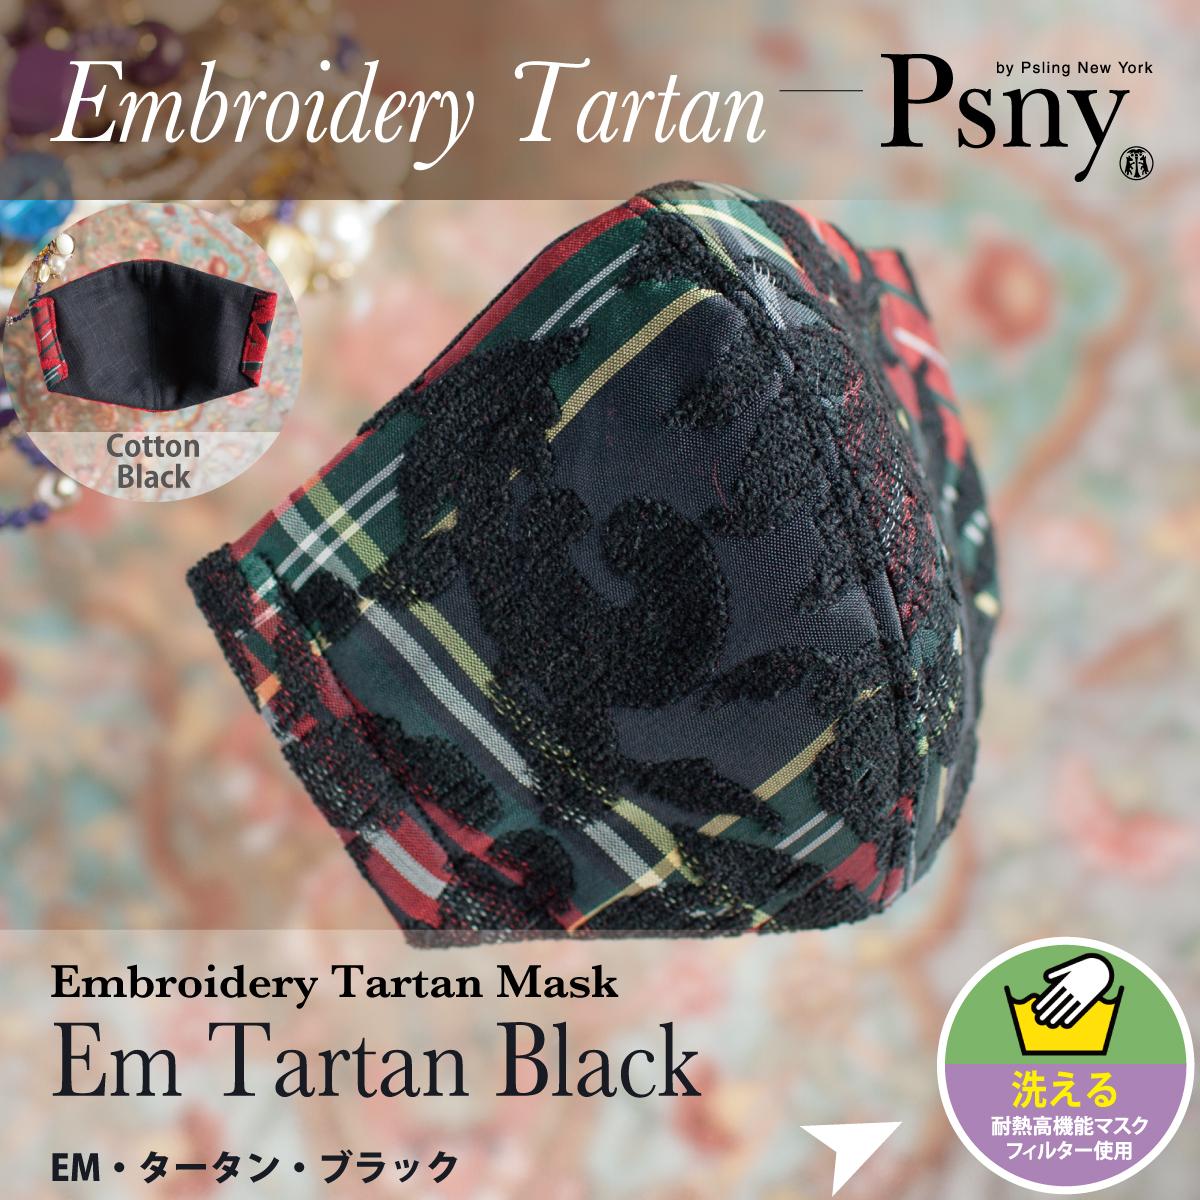 PSNY 刺繍 タータンチェック ブラック 花粉 フィルター入り 立体マスク 大人 薔薇 バラ 高級 美人 おしゃれ